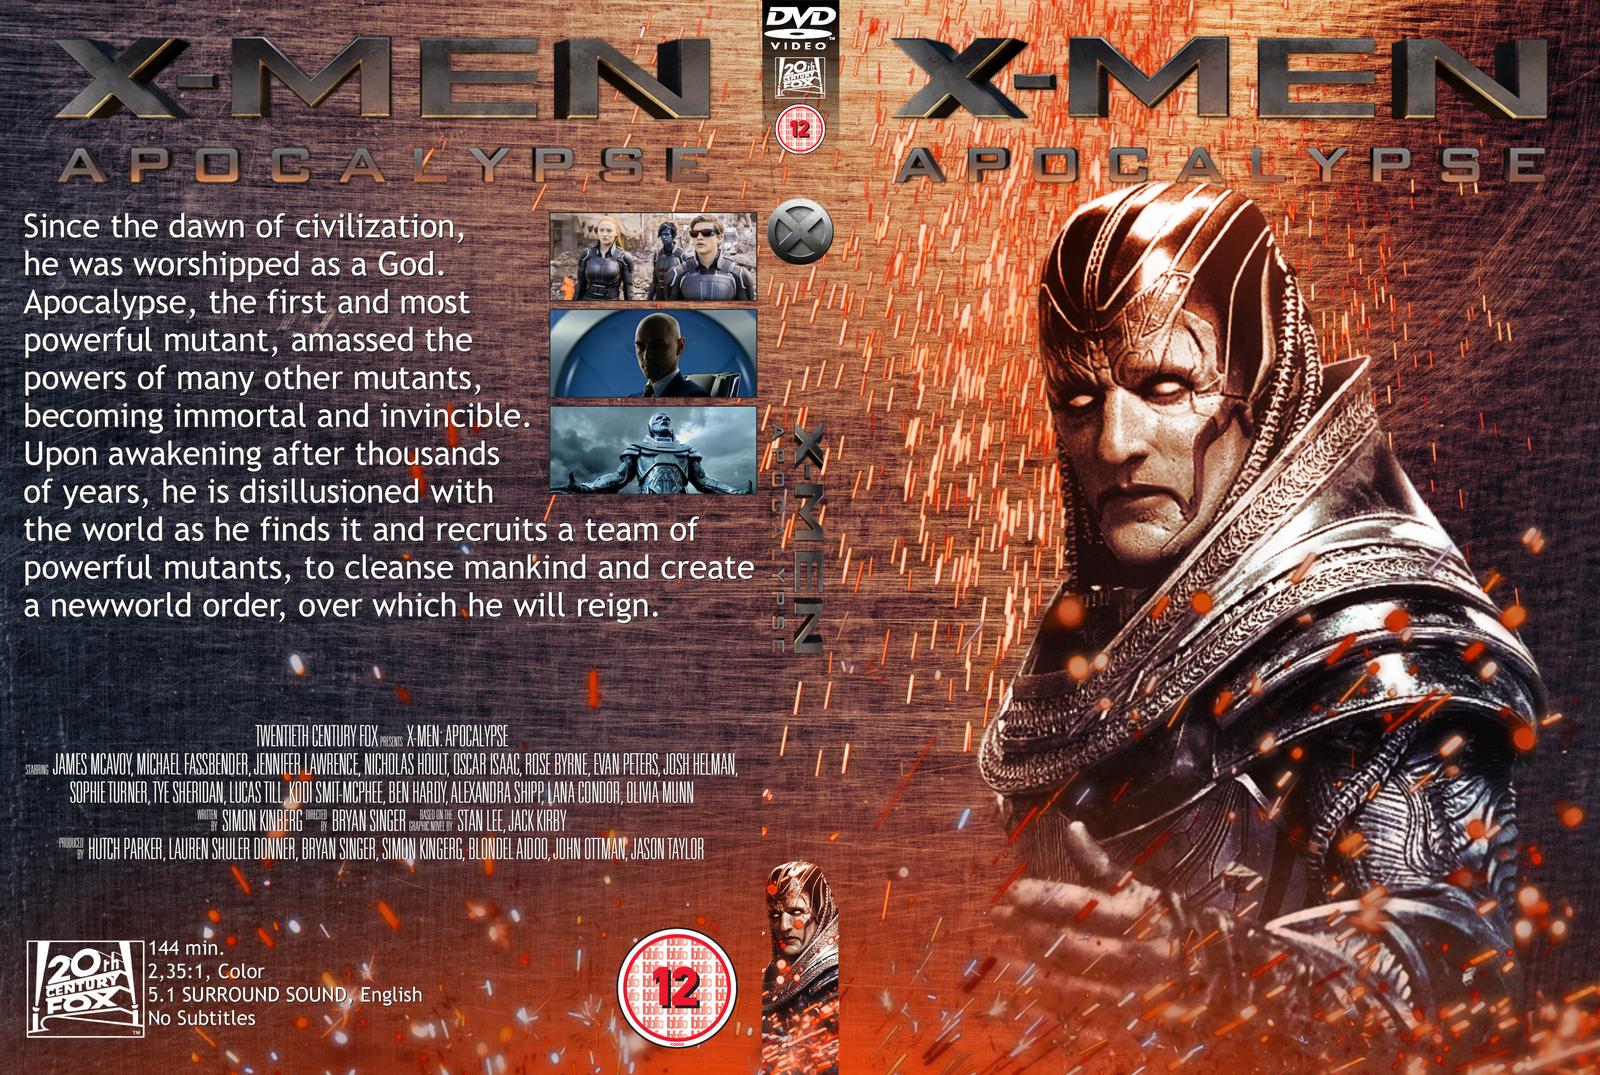 X Men Dvd Cover: Apocalypse DVD Cover By Wario64I On DeviantArt